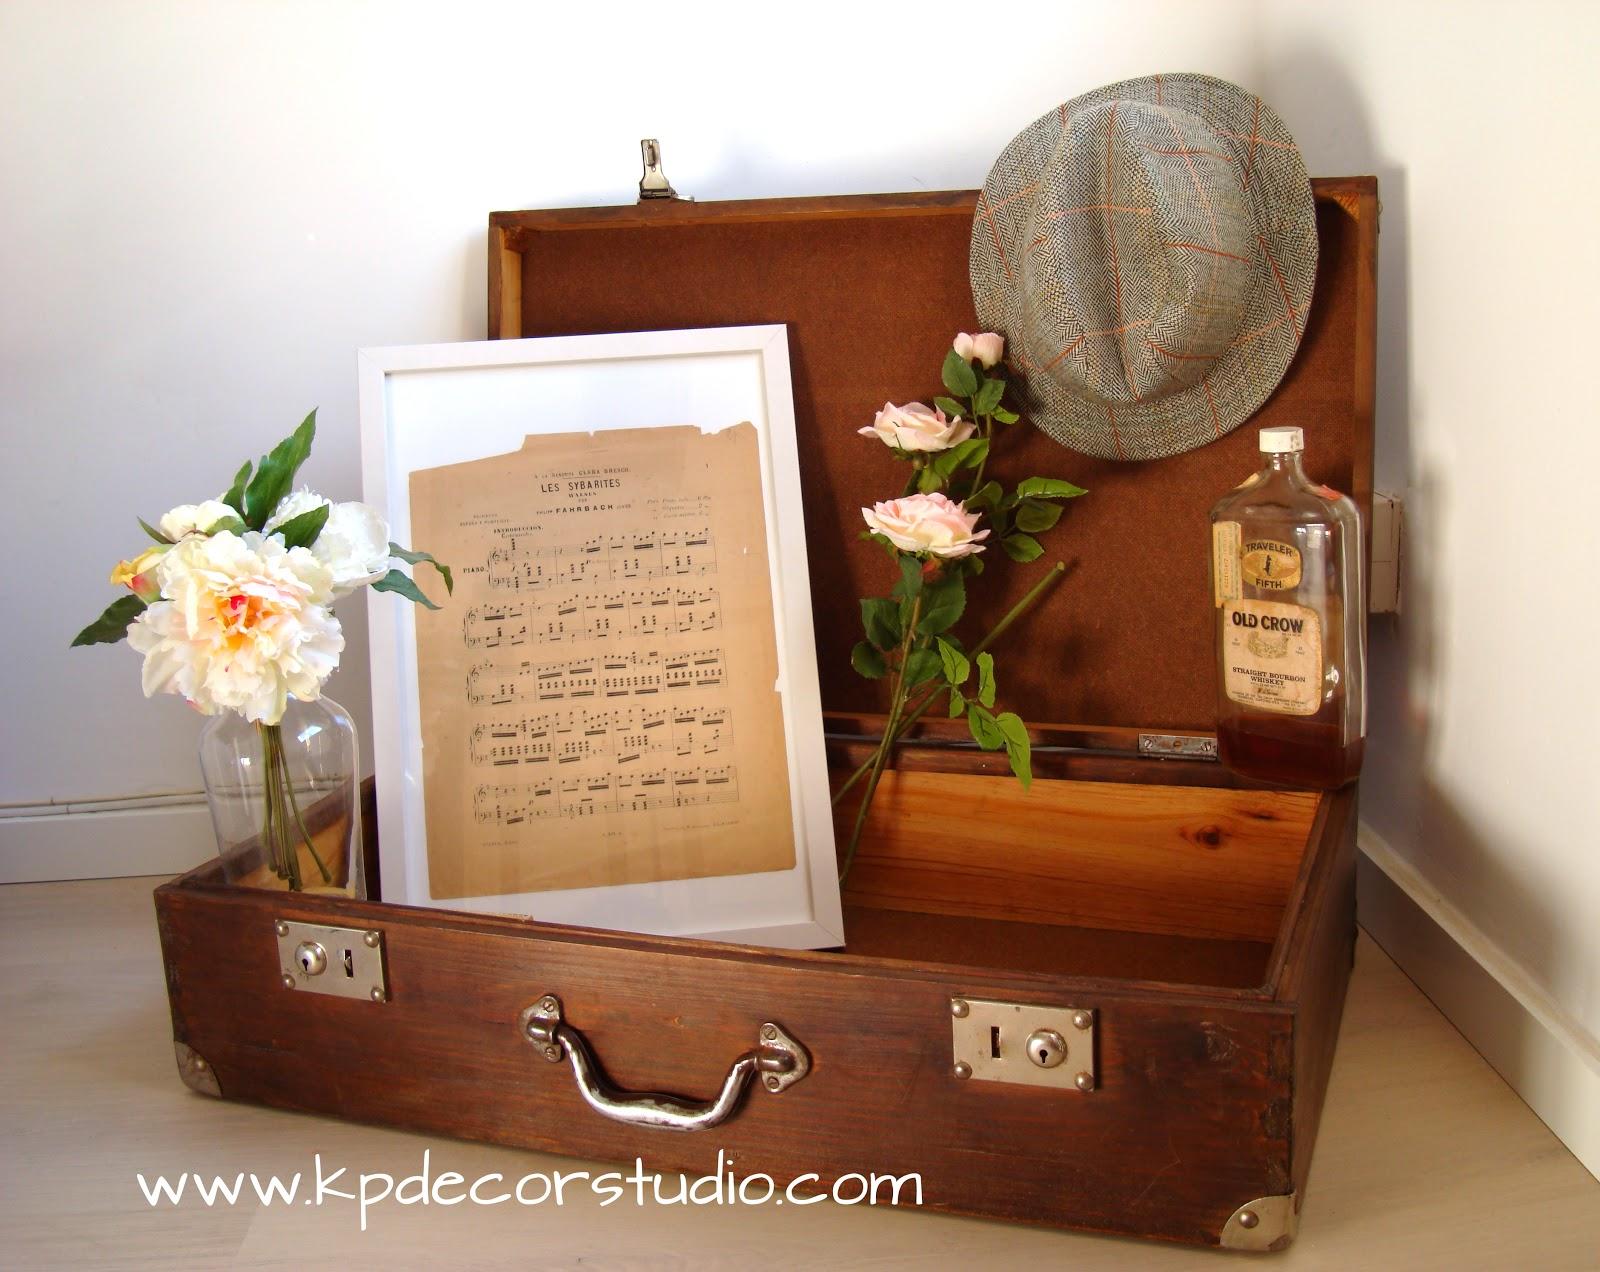 Kp tienda vintage online maleta de madera antigua old for Maletas antiguas online